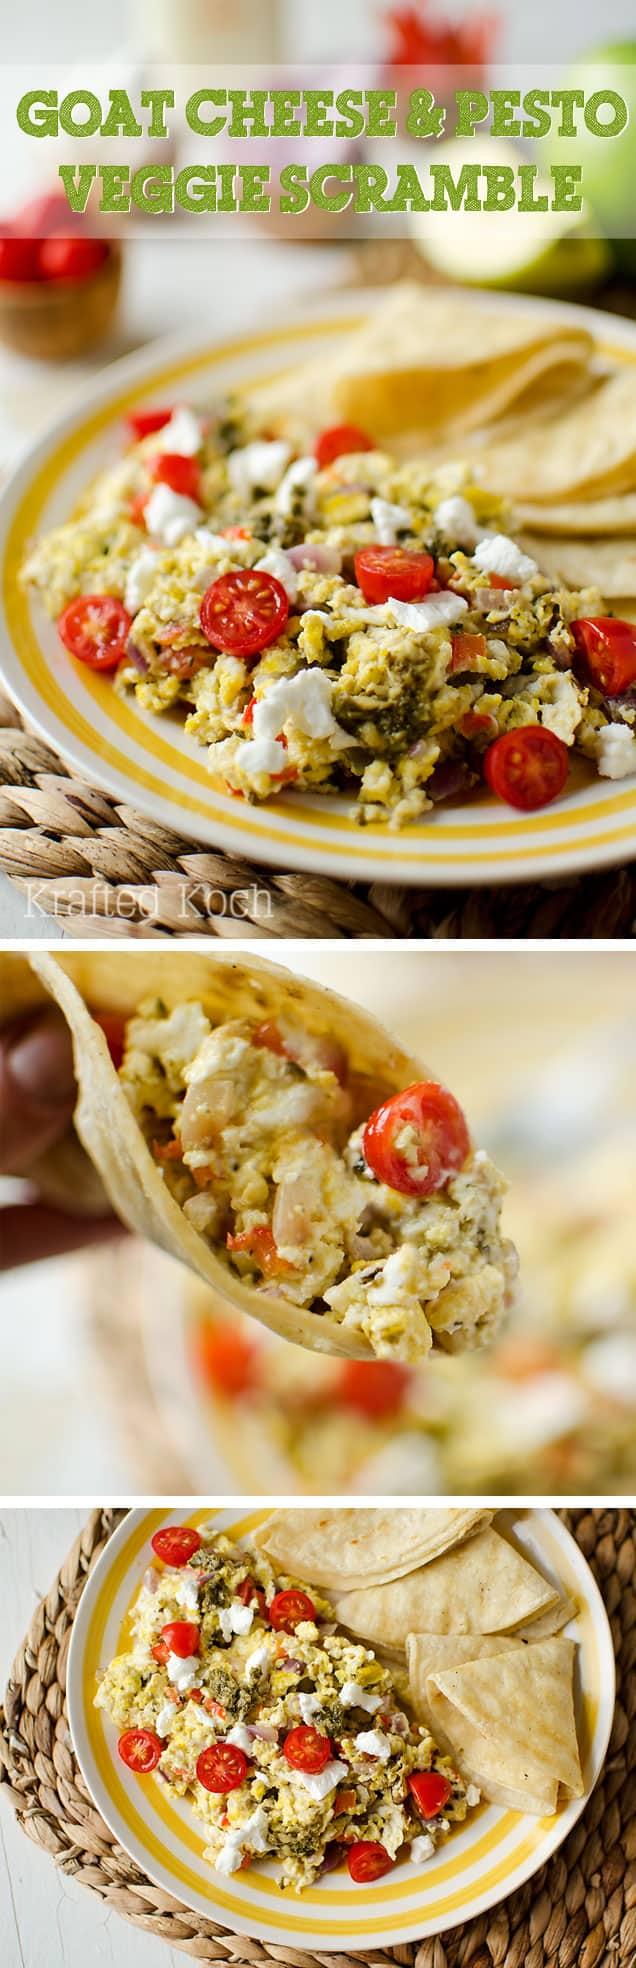 Goat Cheese & Pesto Veggie Scramble - Krafted Koch